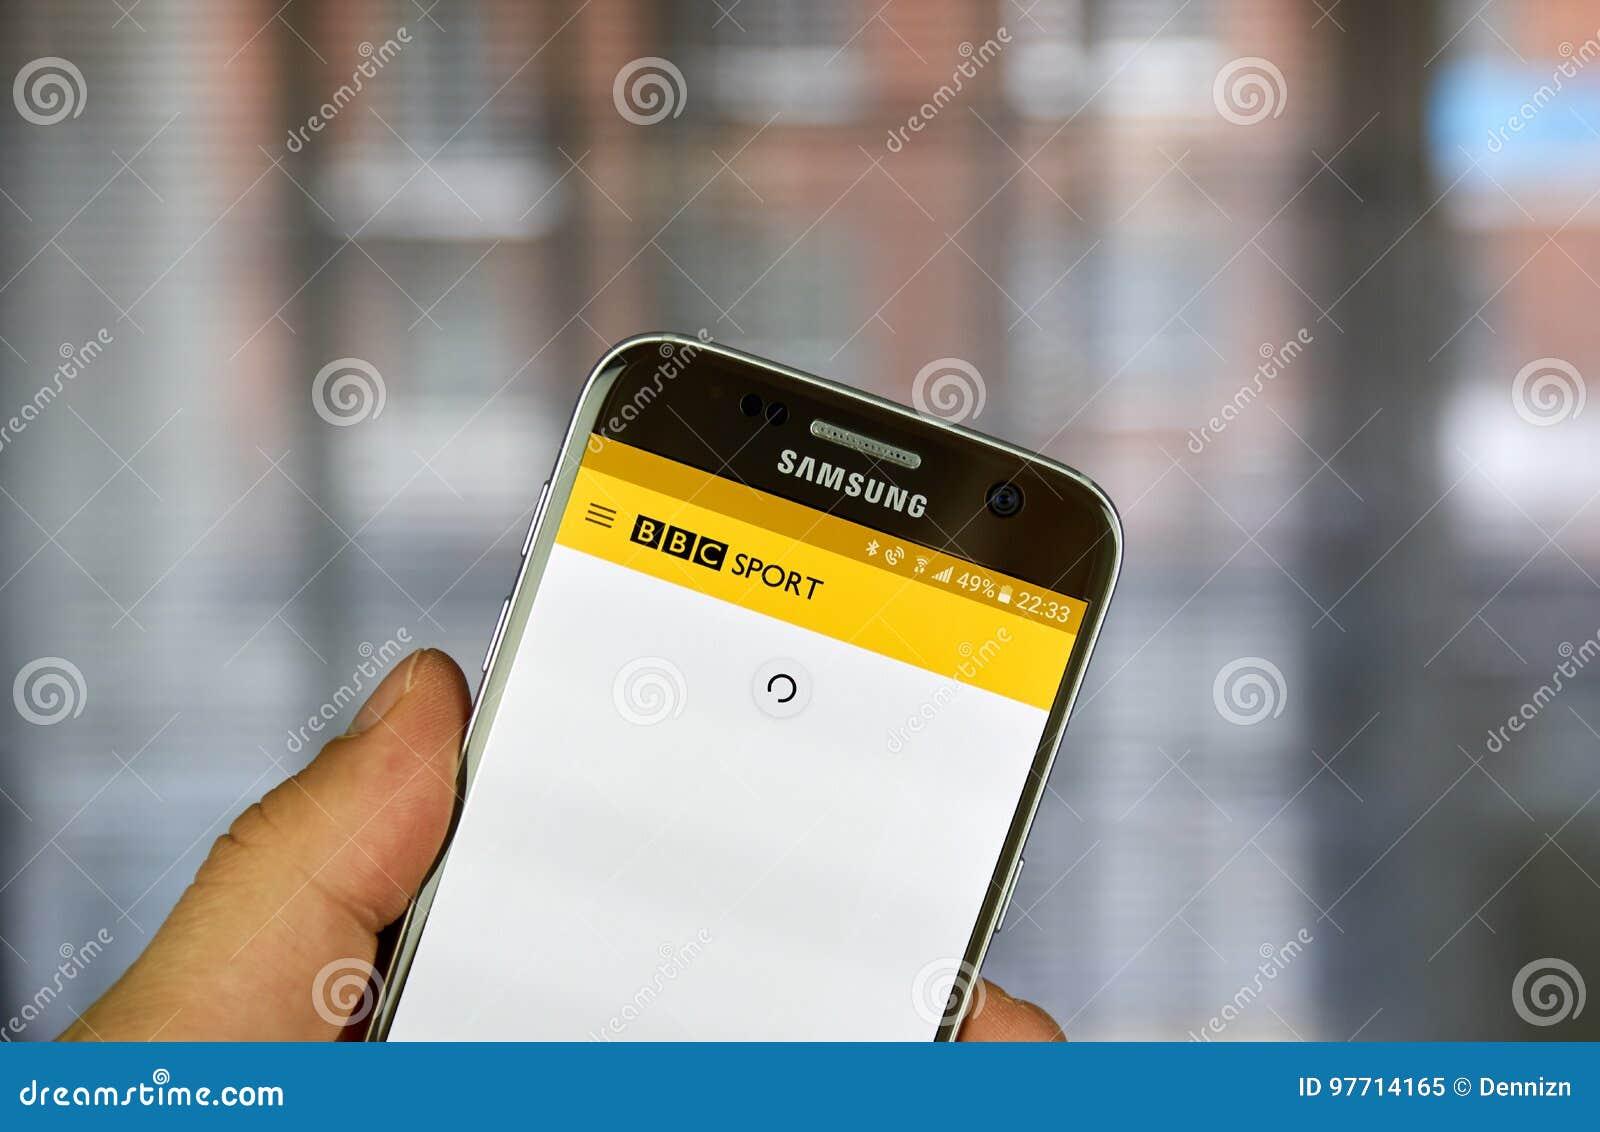 Download the bbc sport app bbc news youtube.